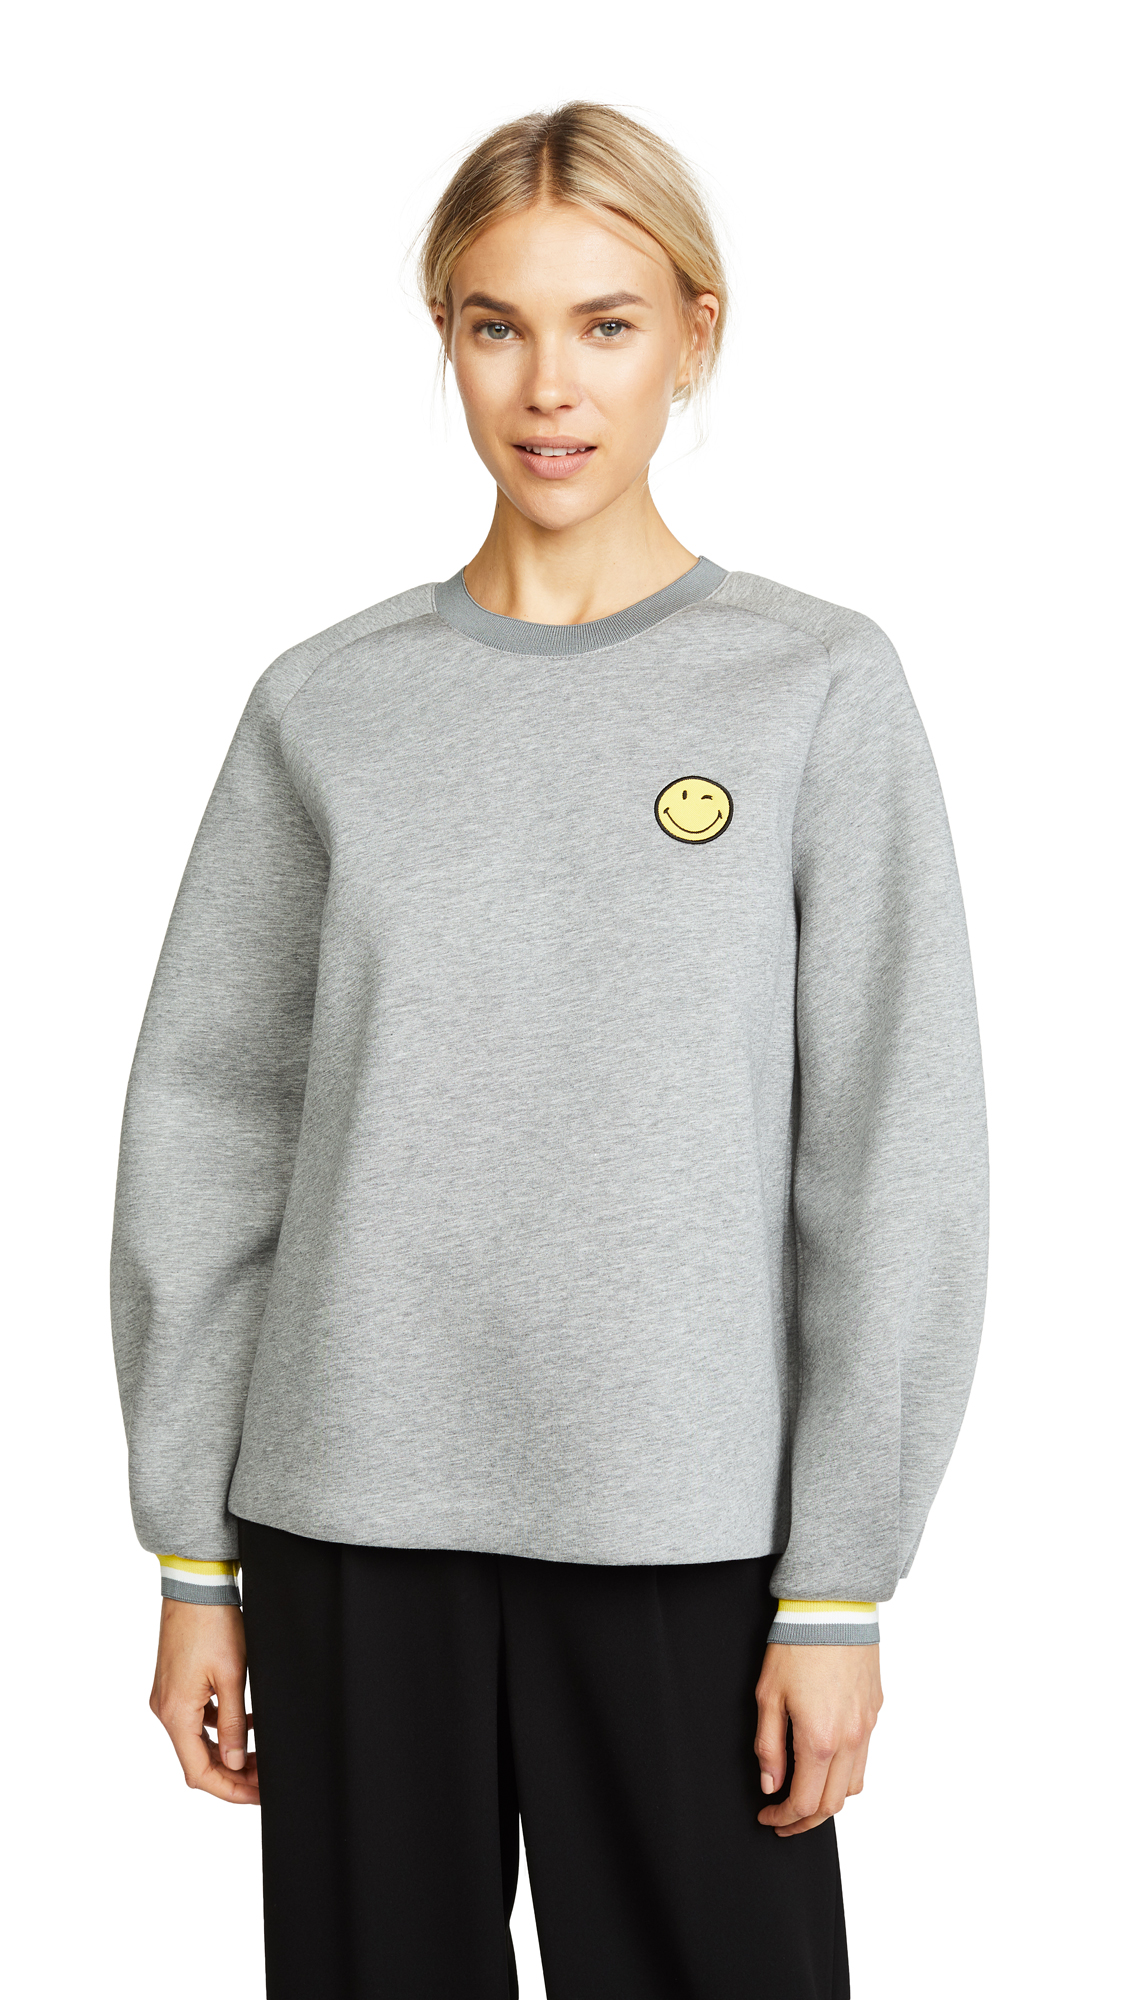 Anya Hindmarch Wink Sweatshirt In Light Slate